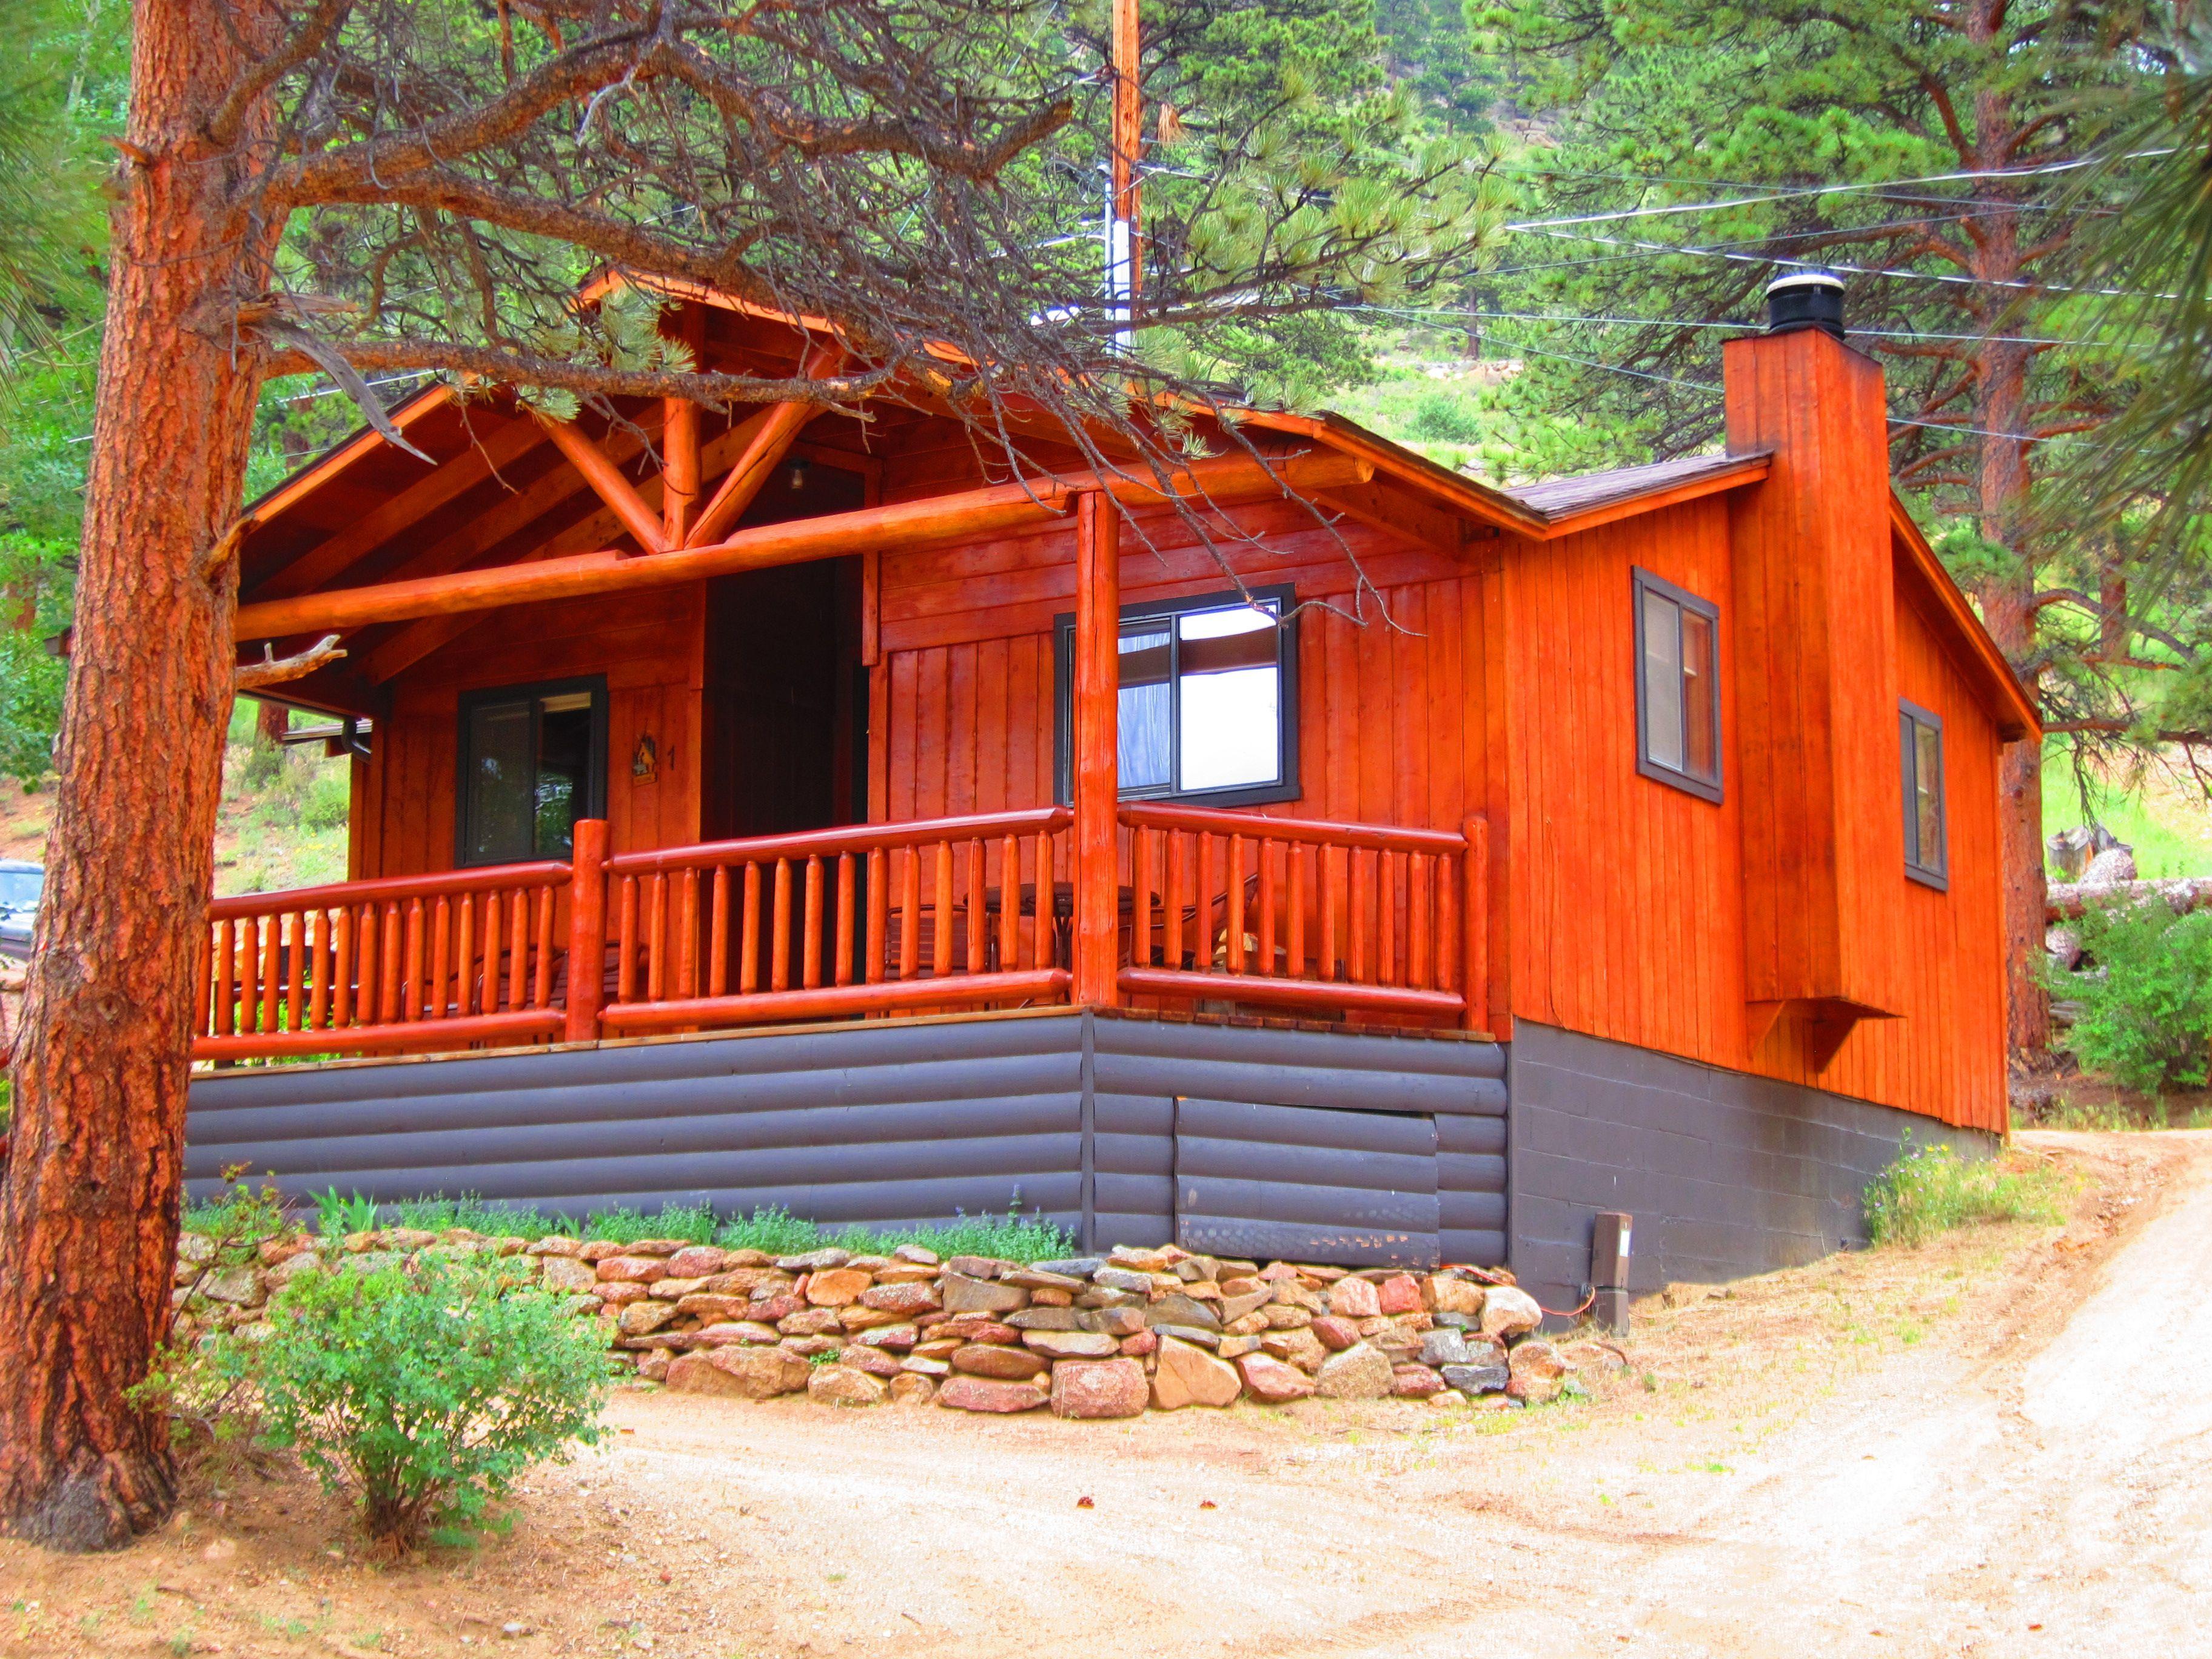 cabin of views cabins sal friendly rentals denver mountains utah mounta moab in unitedstatesofamerica family panoramic rental la with mountainstates